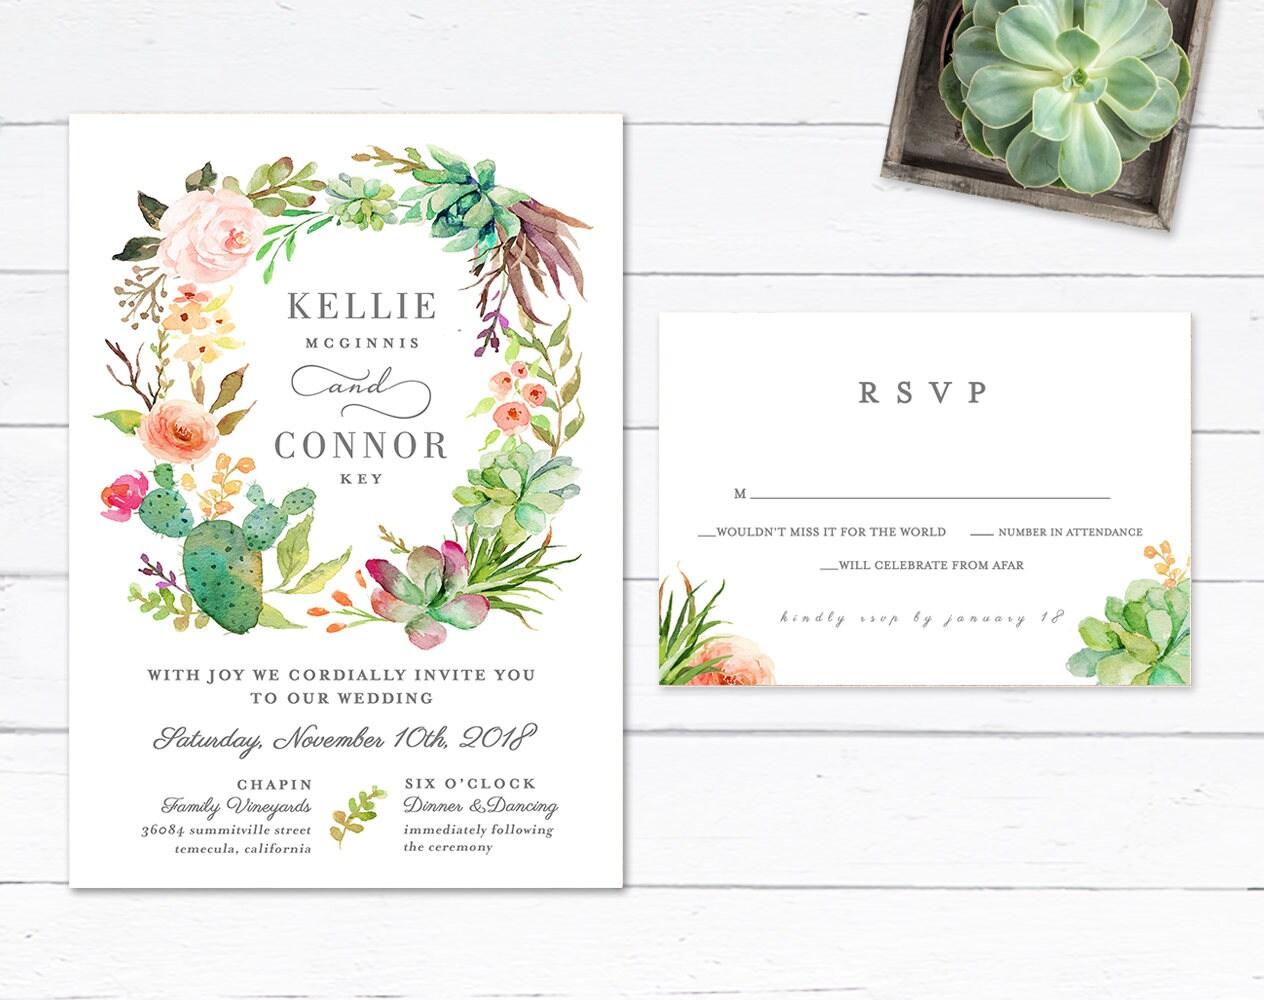 Desert Wedding Invitation Succulent Wedding Invitation | Etsy